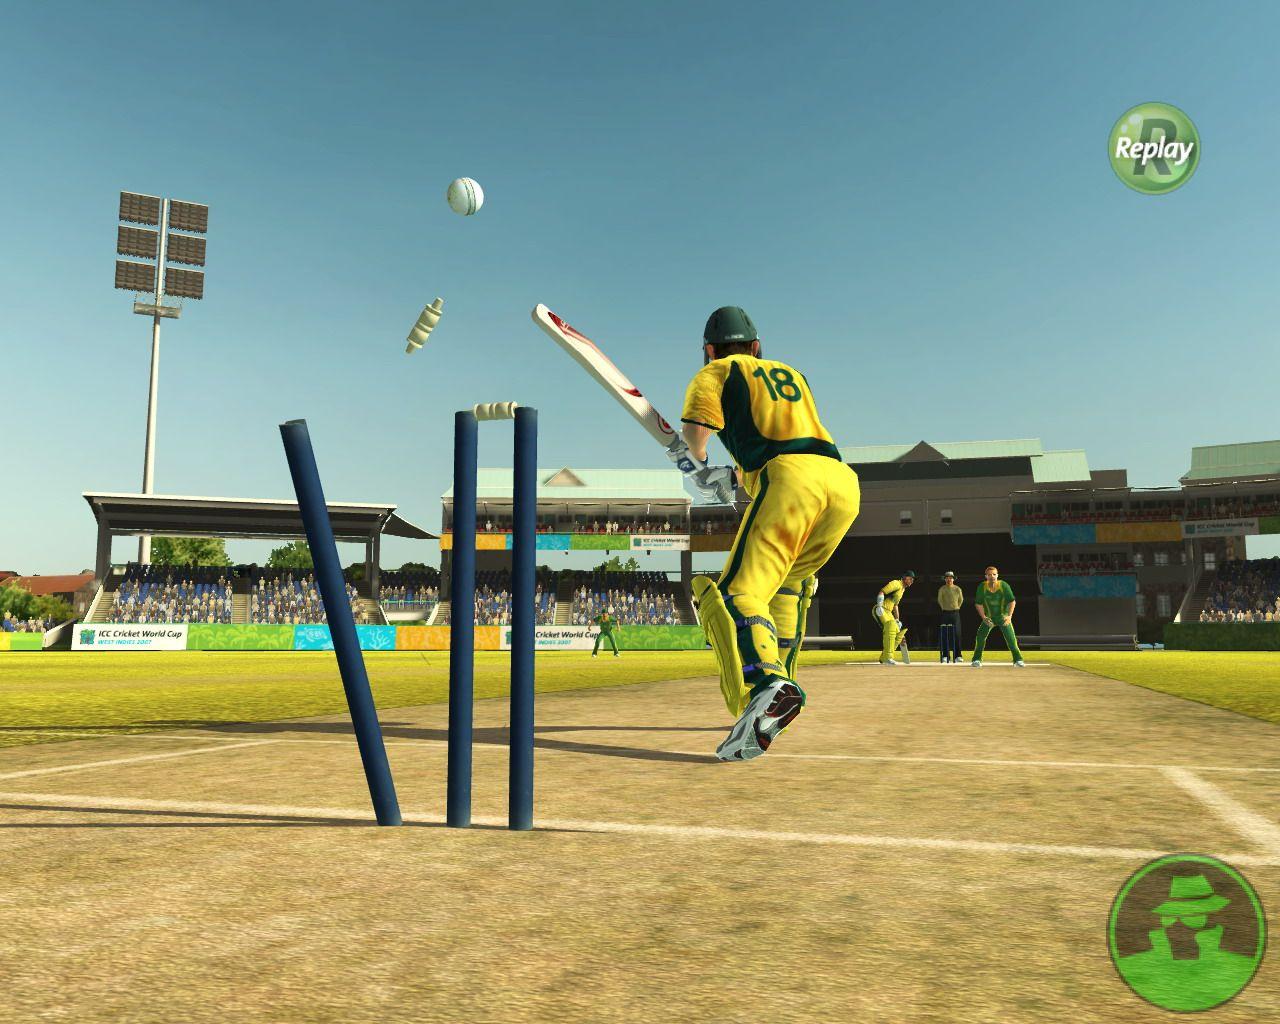 Files for International Cricket Captain 2013